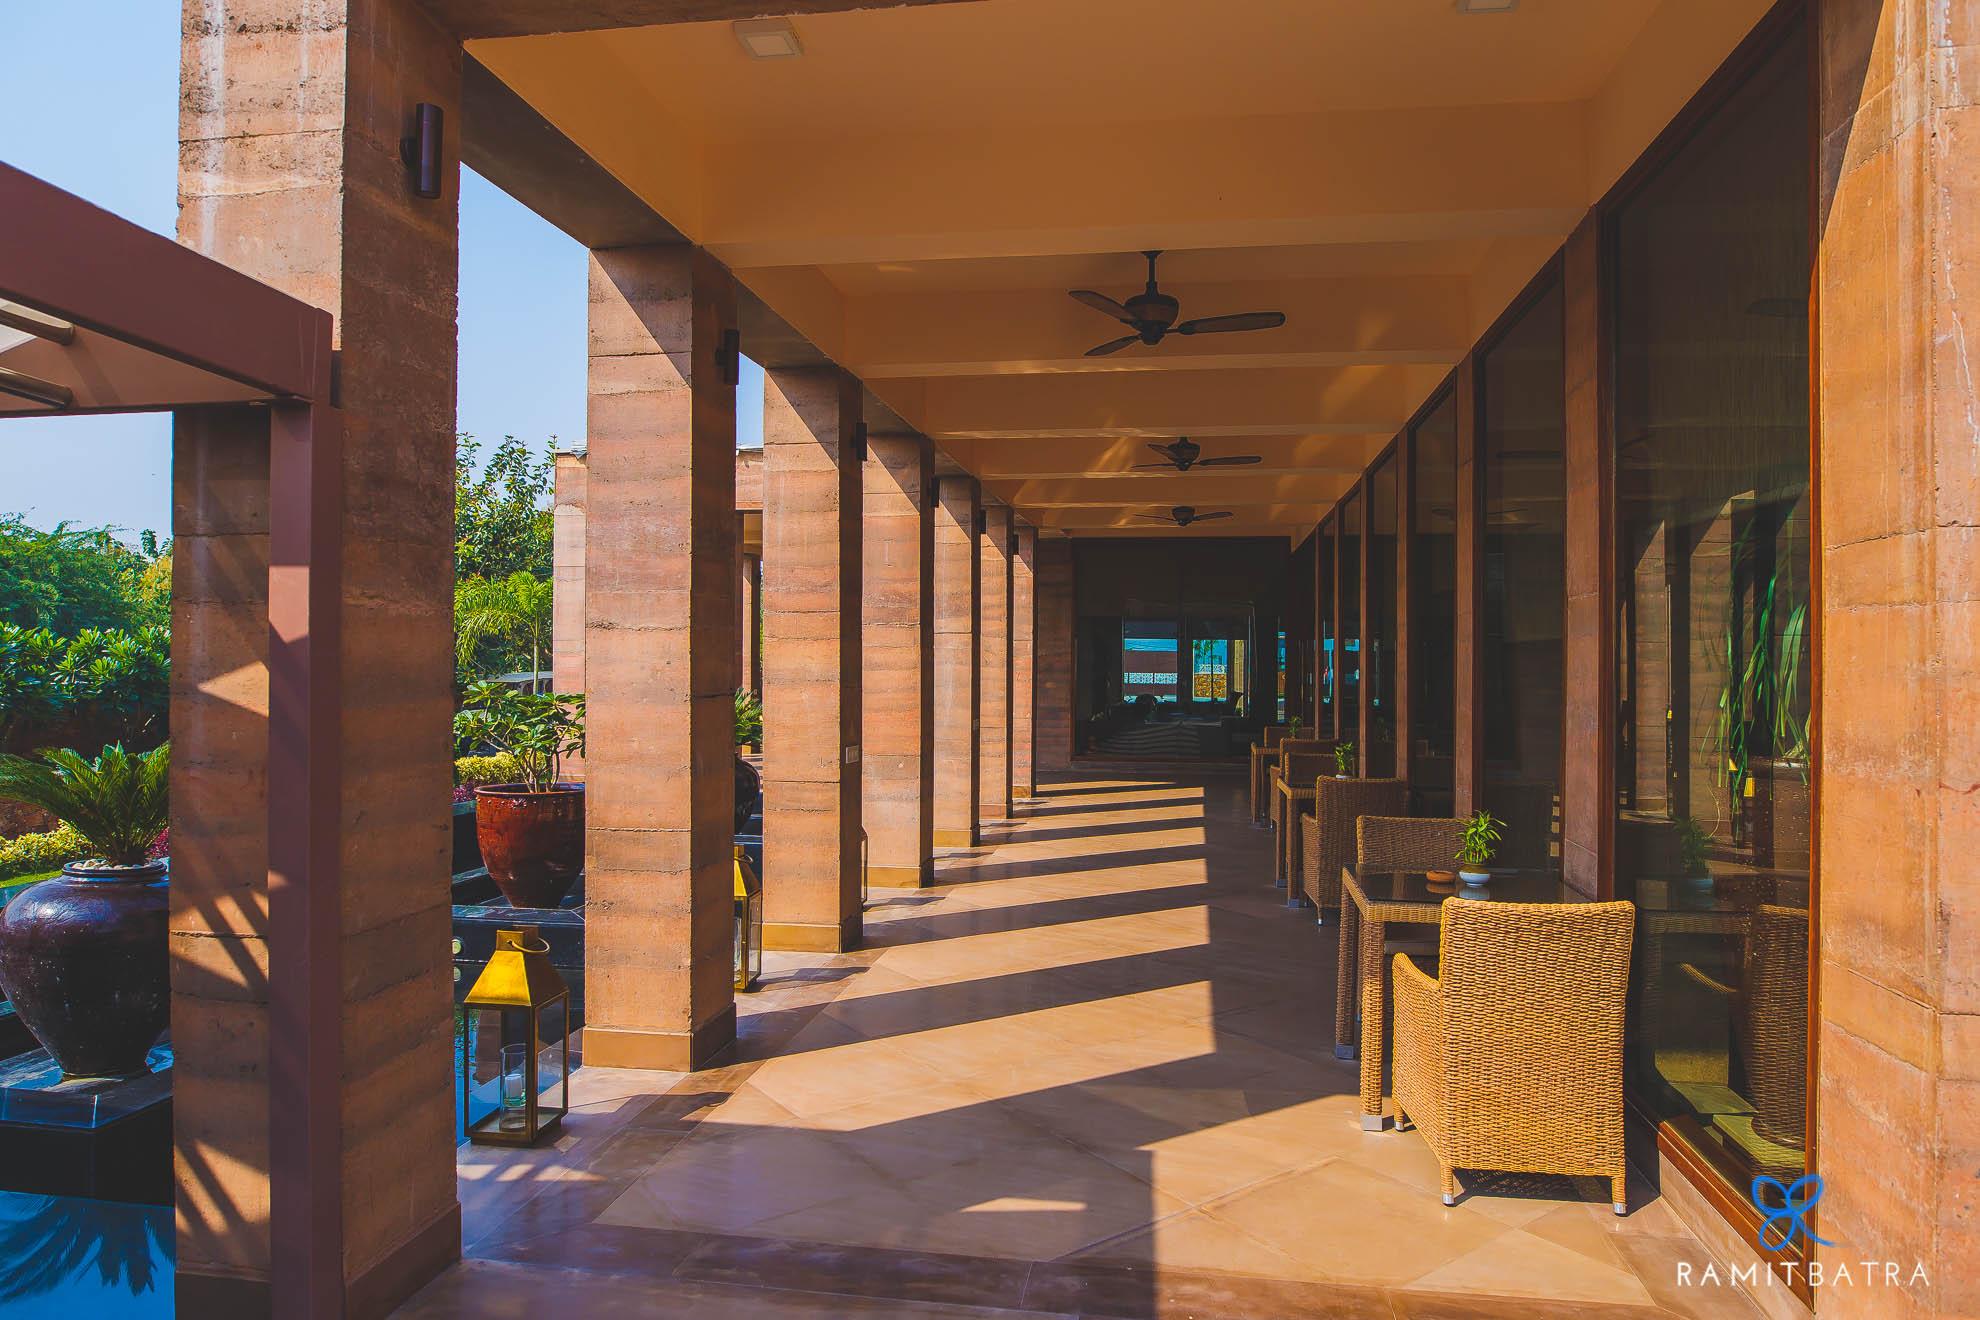 lalit-mangar-hotel-near-delhi-ramitbatra-013